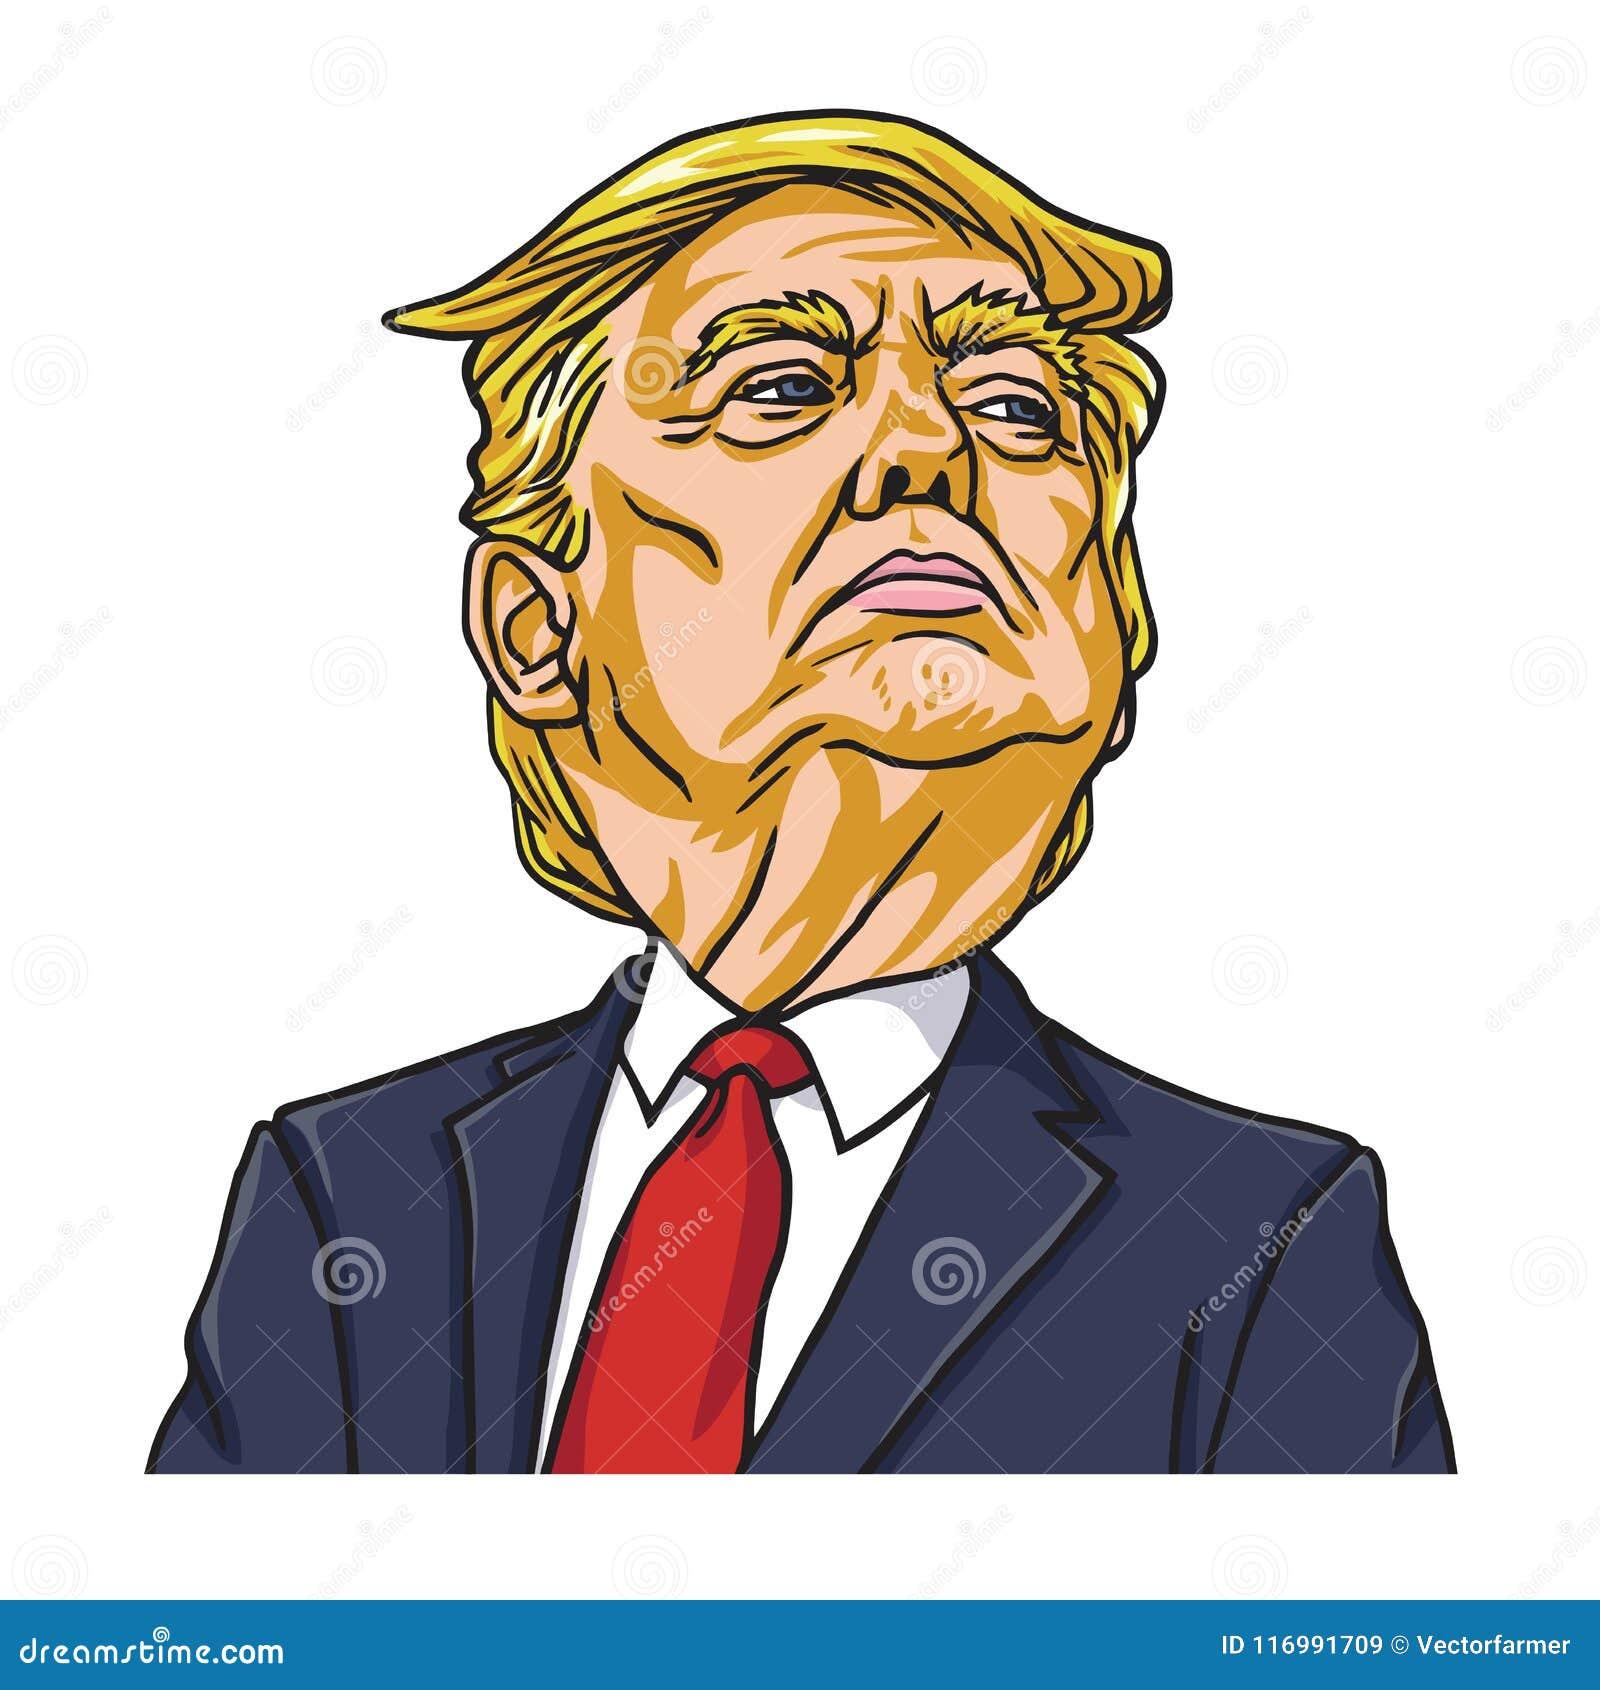 Donald Trump the President of the United States of America. Cartoon. Washington, May 19, 2018